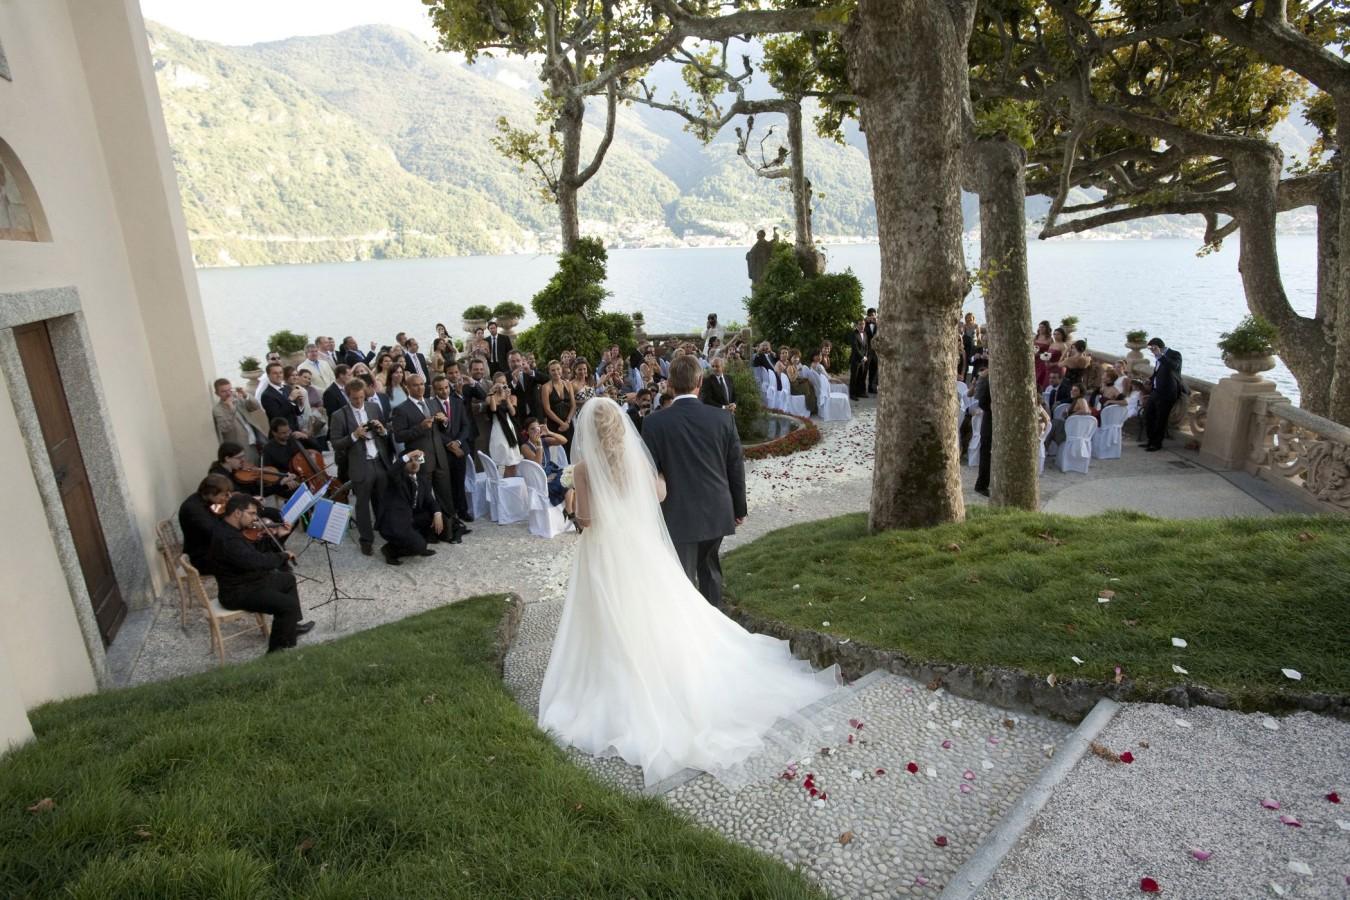 wedding-italy-outdoor-ceremony_06-1350×900